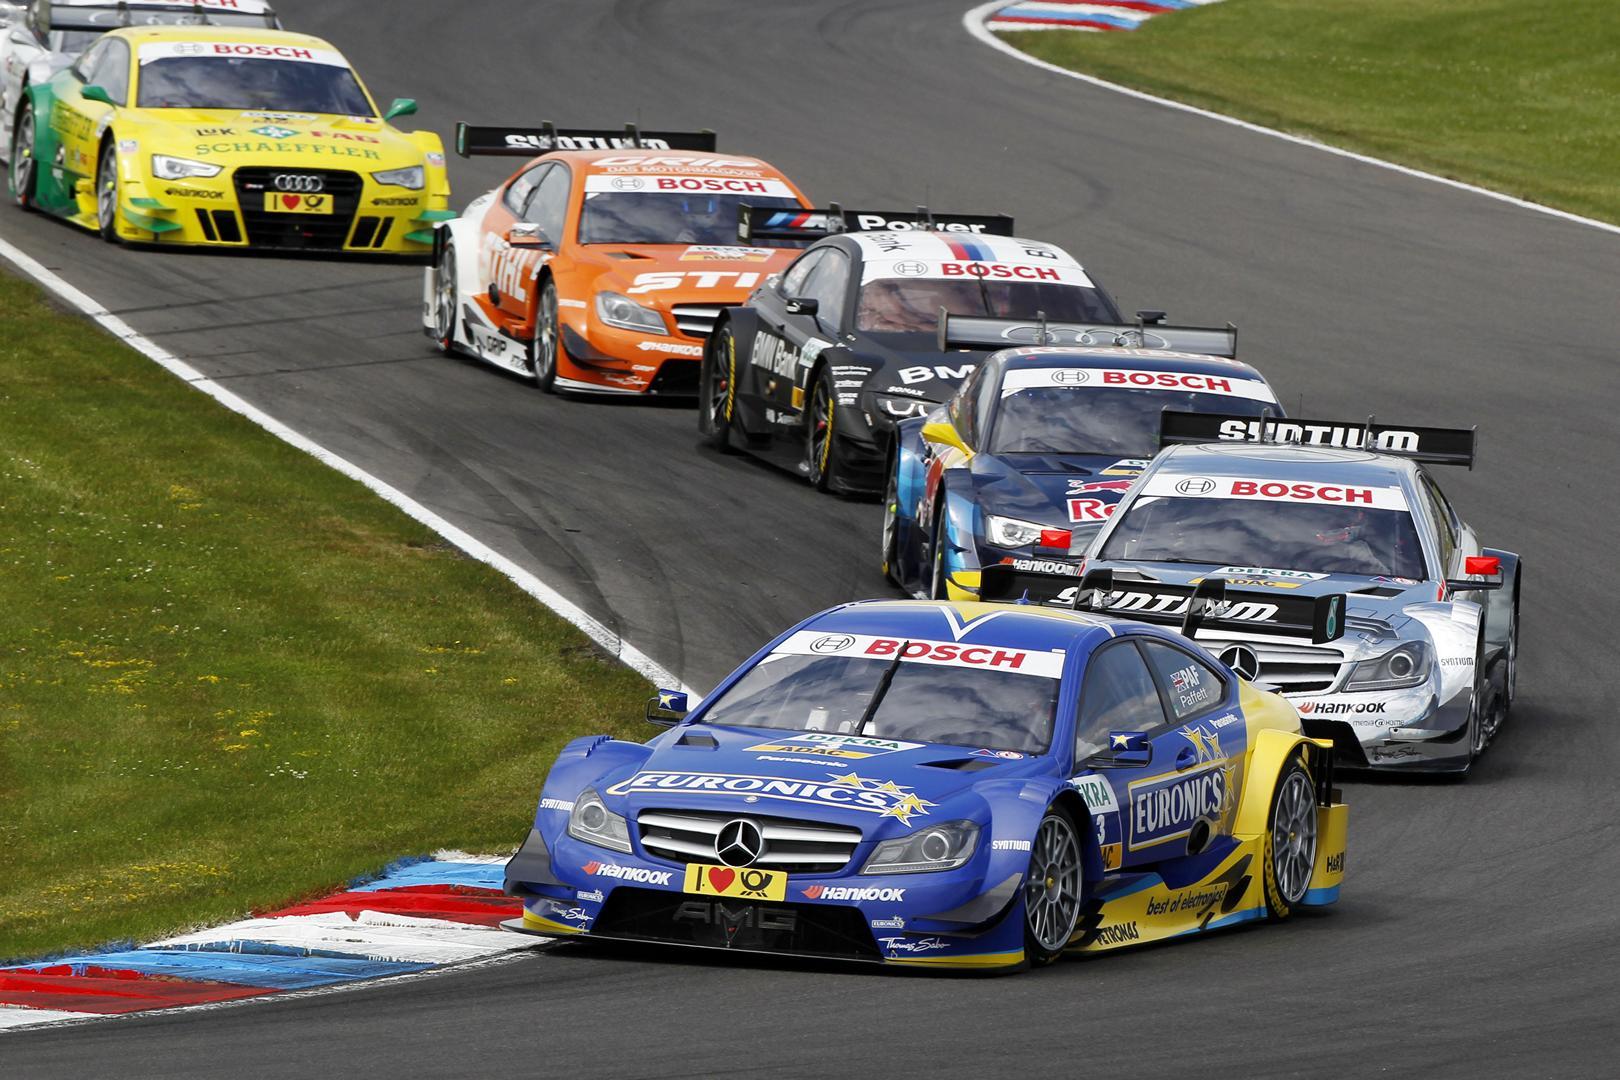 3 Gary Paffett (GB), HWA, DTM Mercedes AMG C-Coupé